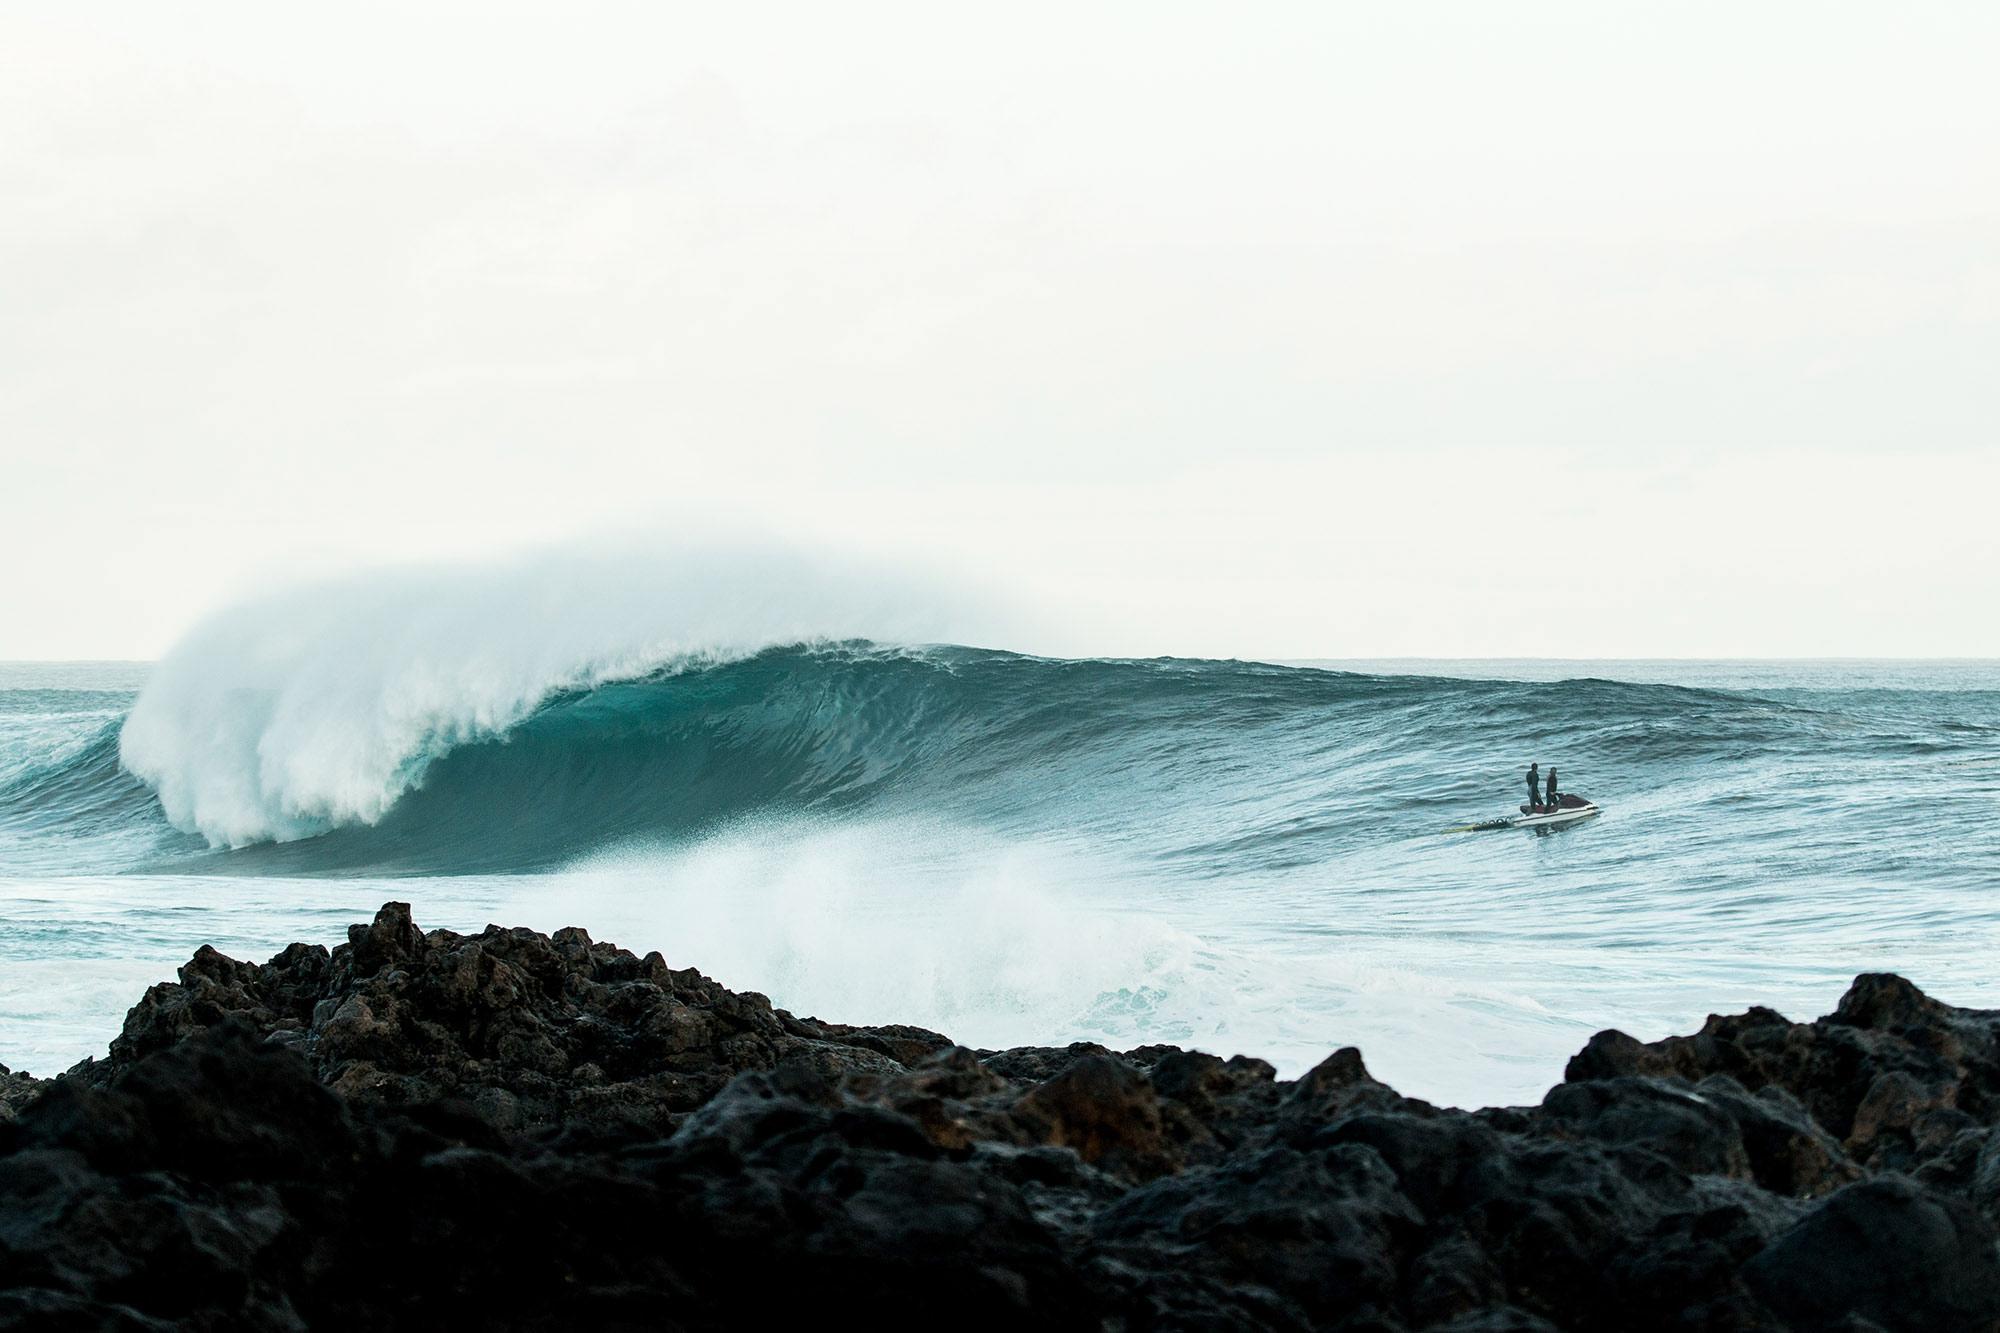 surf-olas-grandes-tenerife-elias-toscal-6071